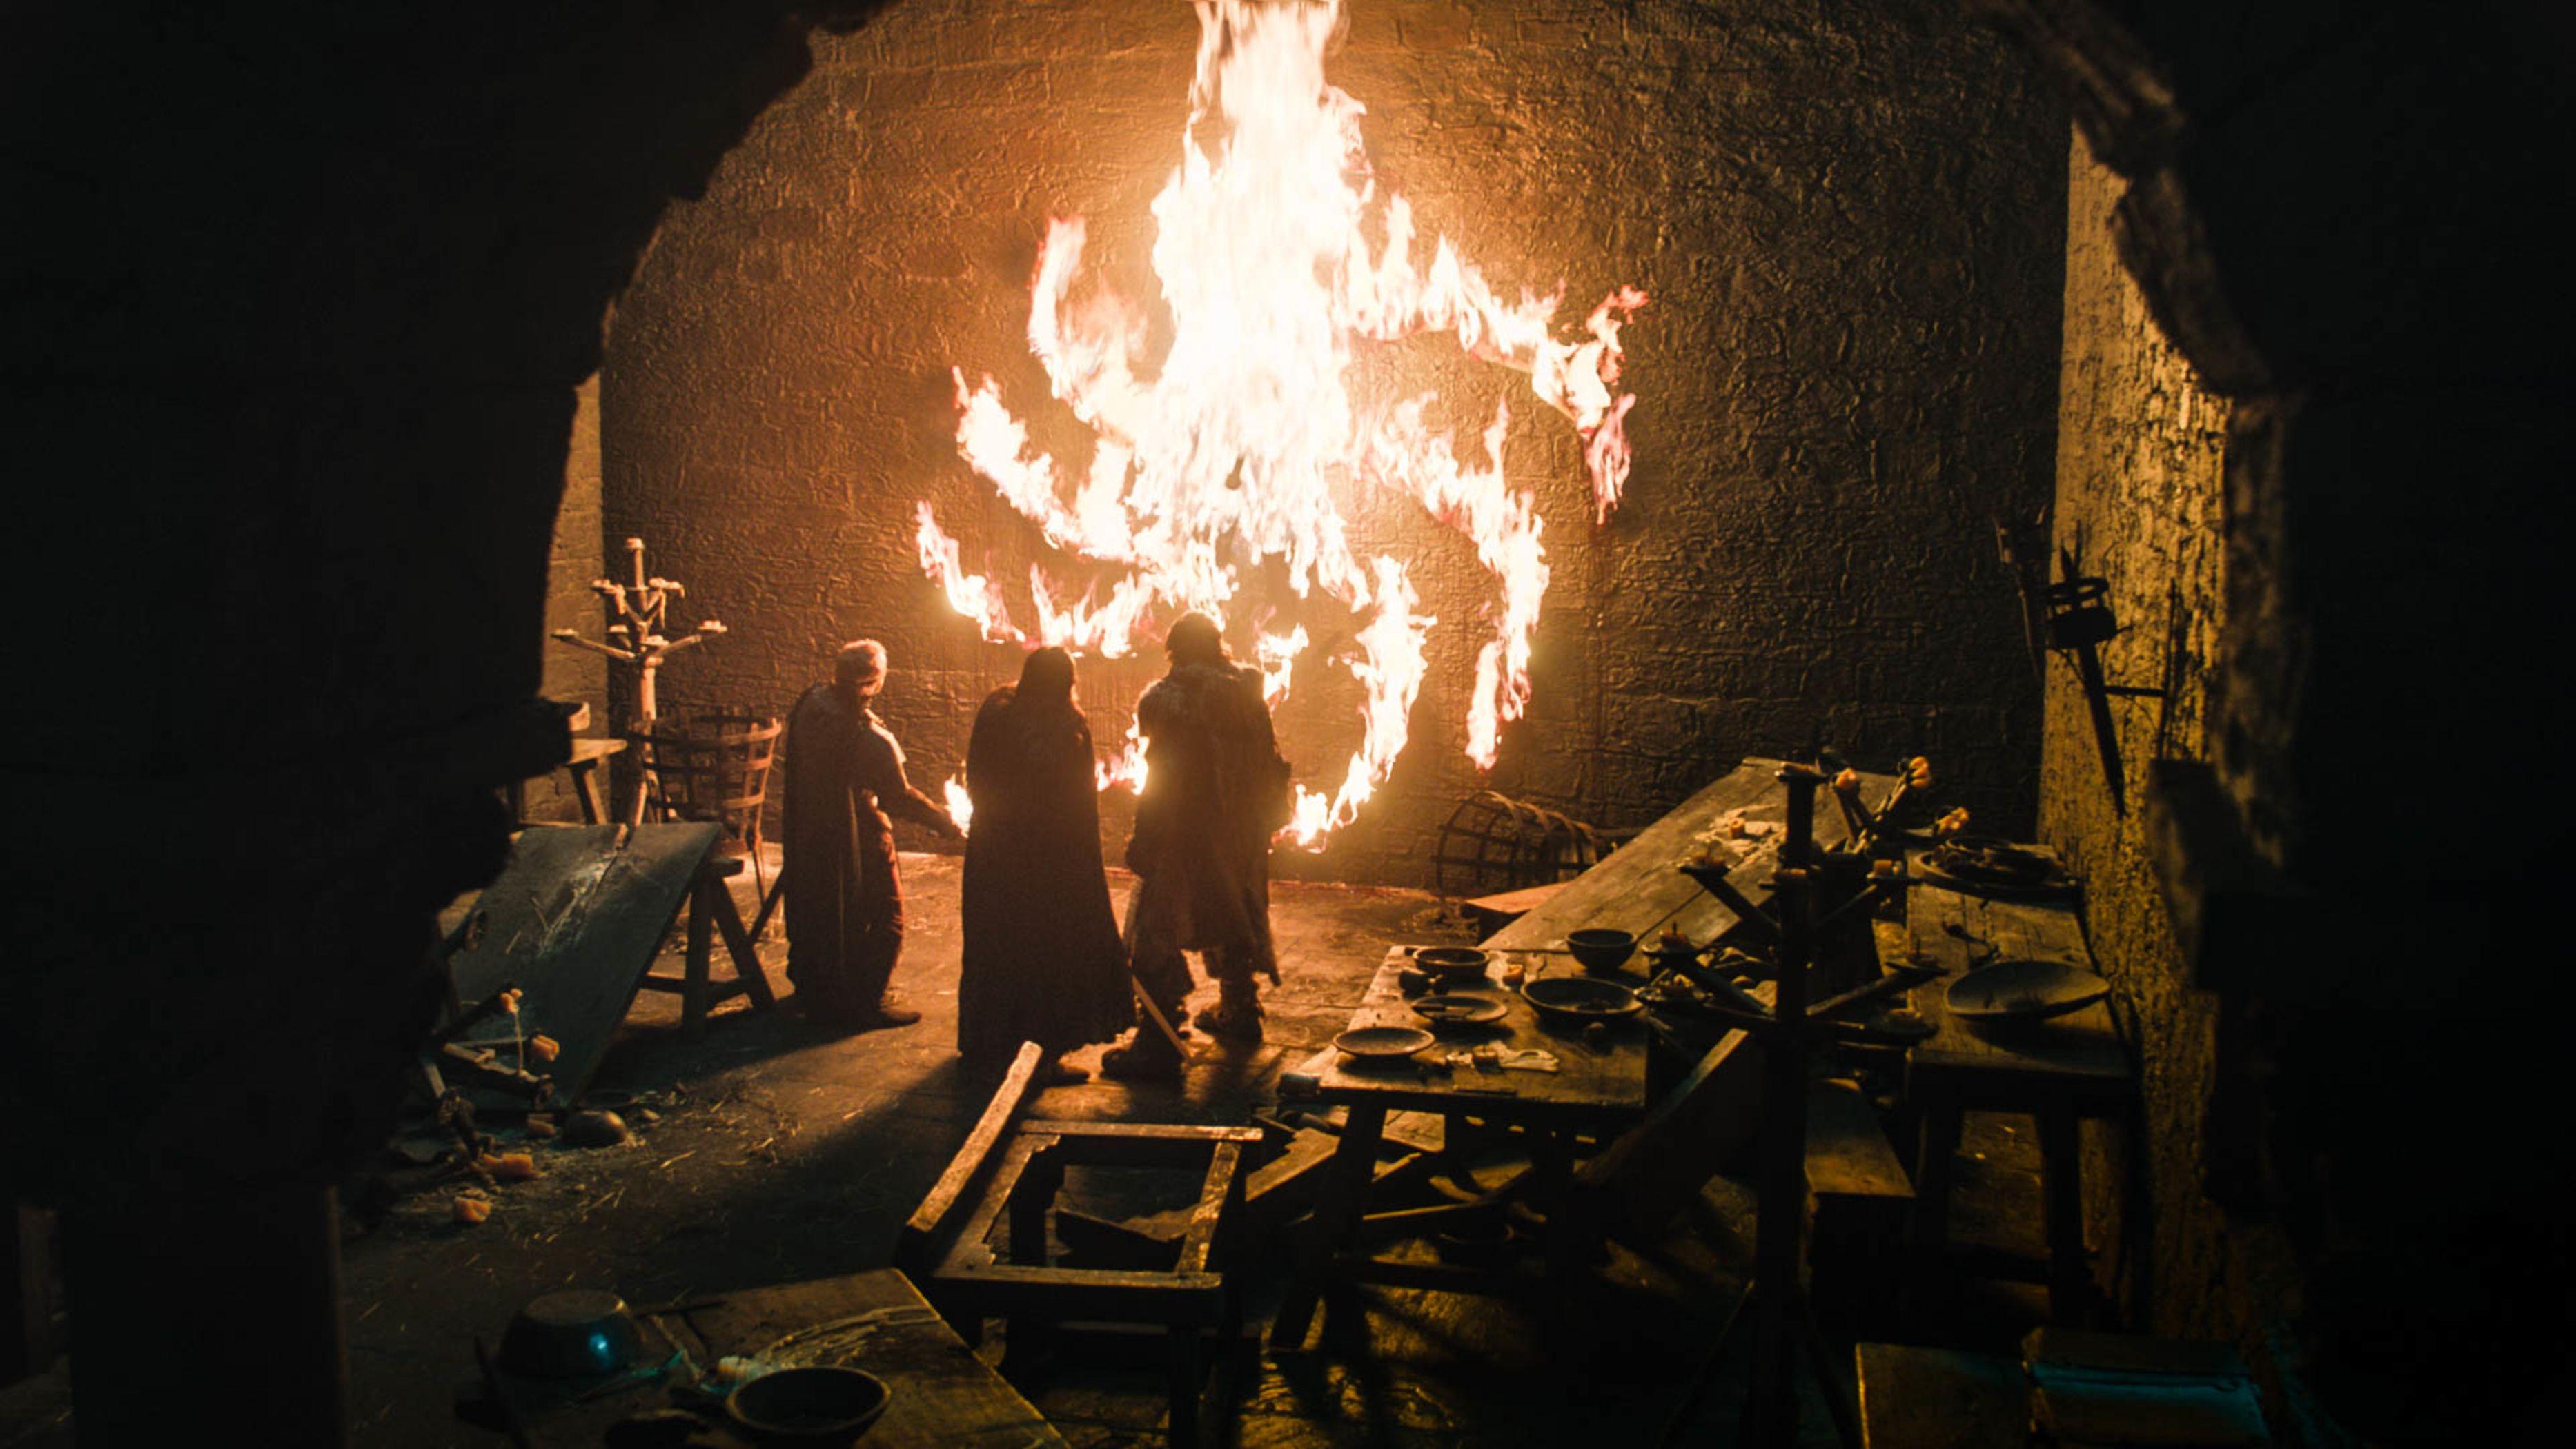 Game Of Thrones White Walker Spiral Symbol Explained